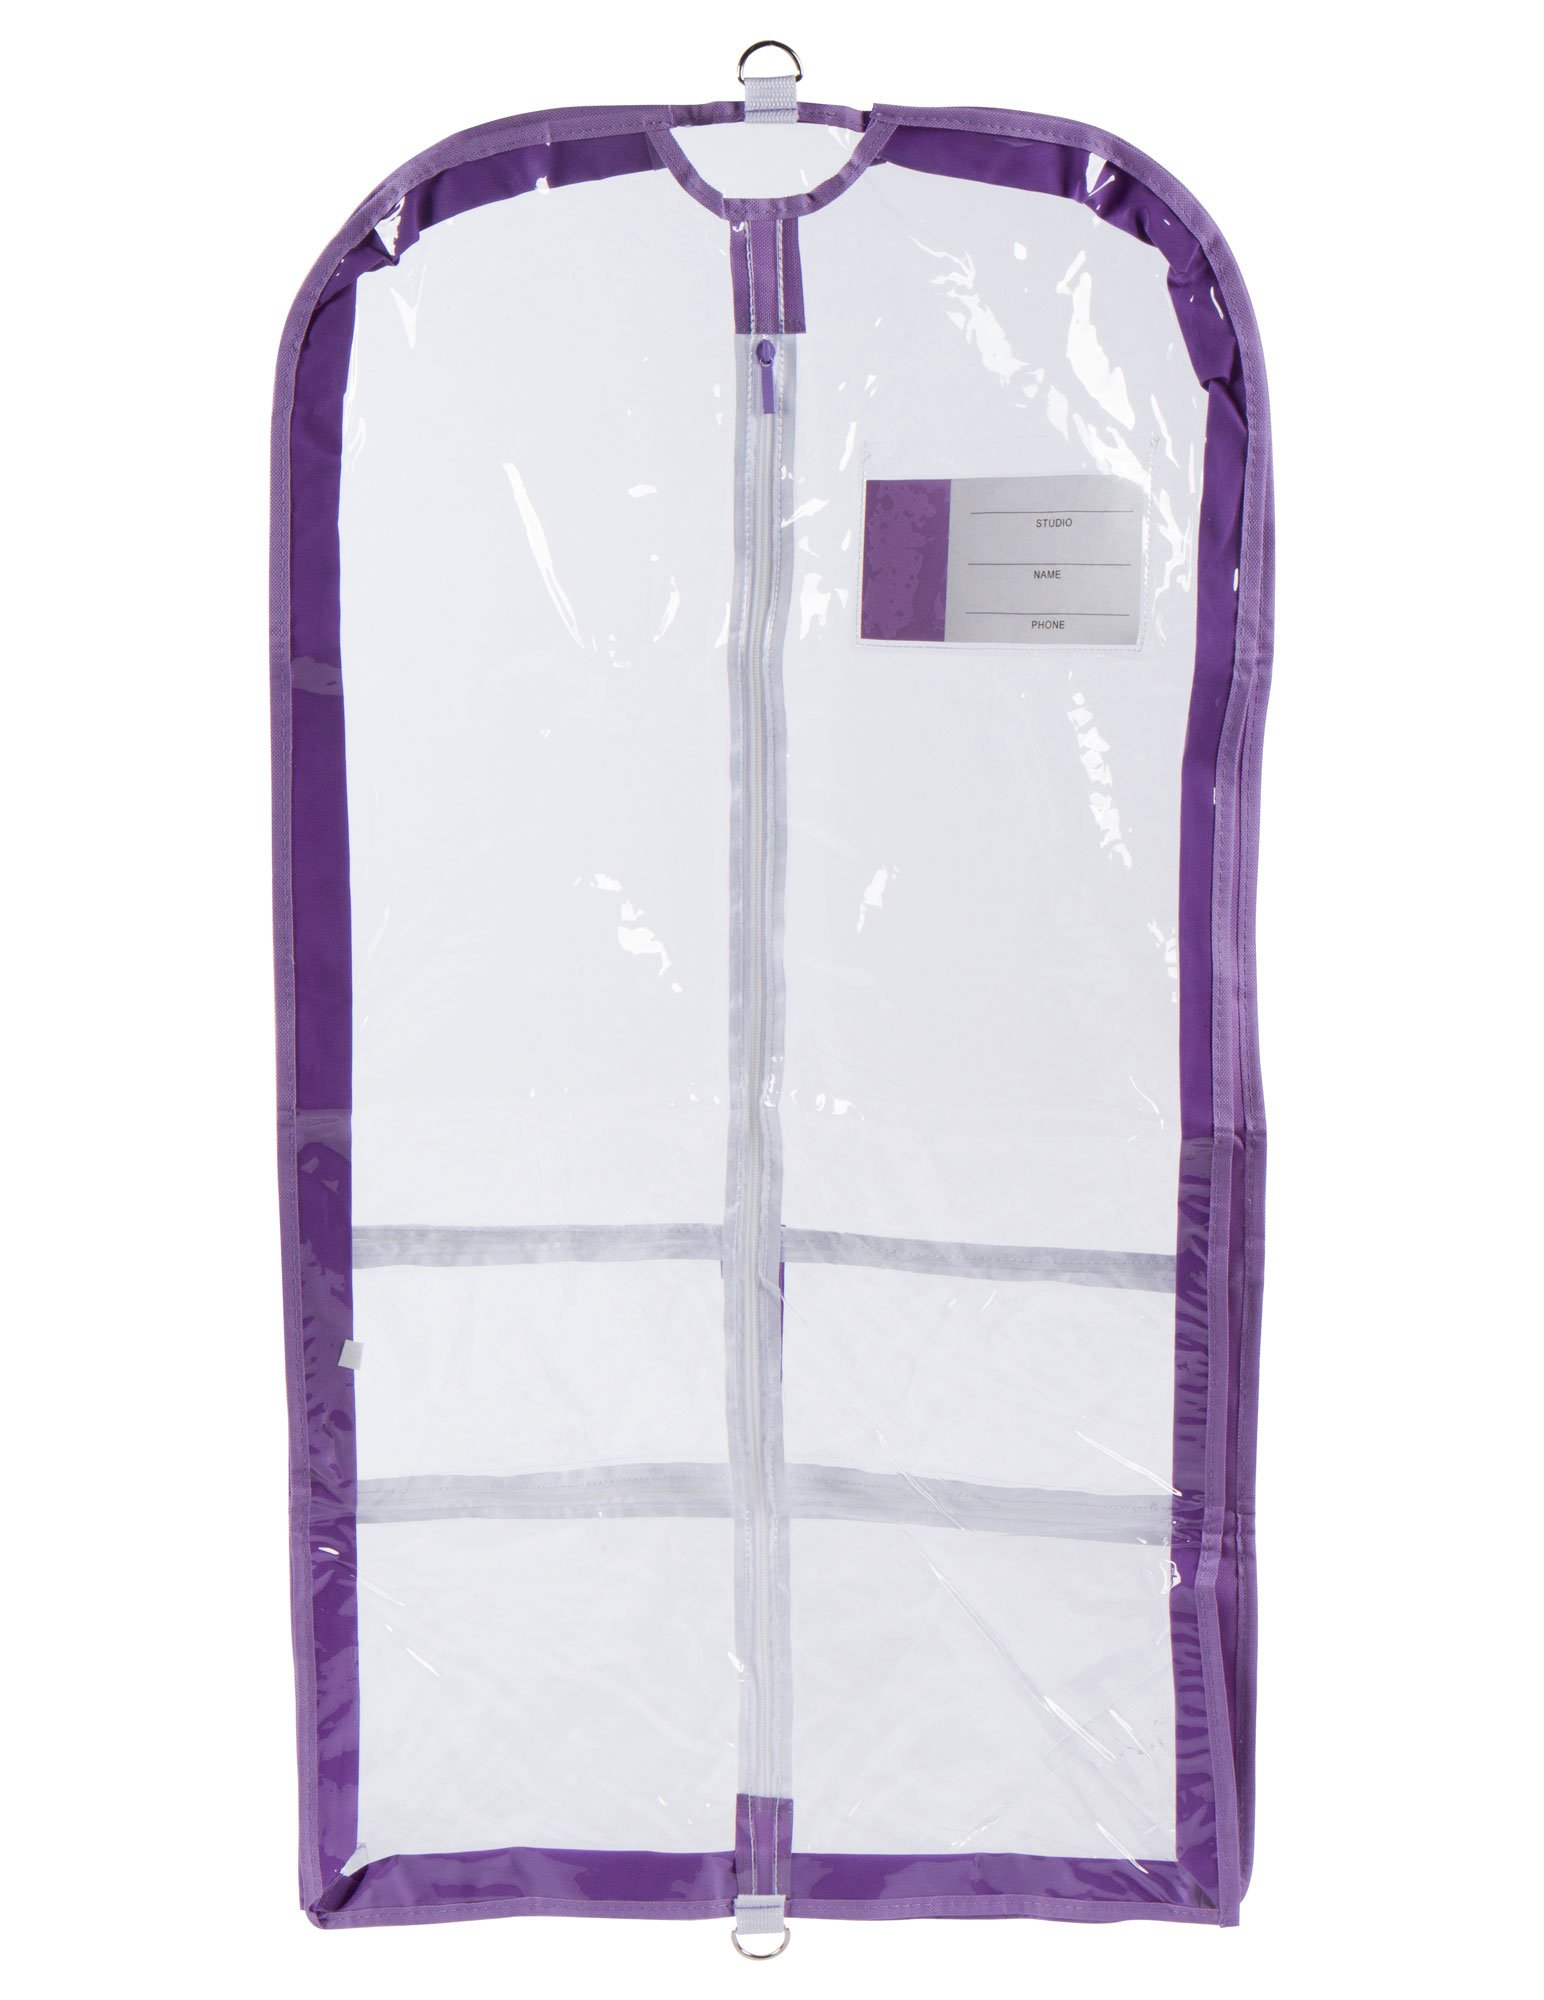 Clear Plastic Garment Bag with Pockets for Dance Competitions Danshuz - Lavender